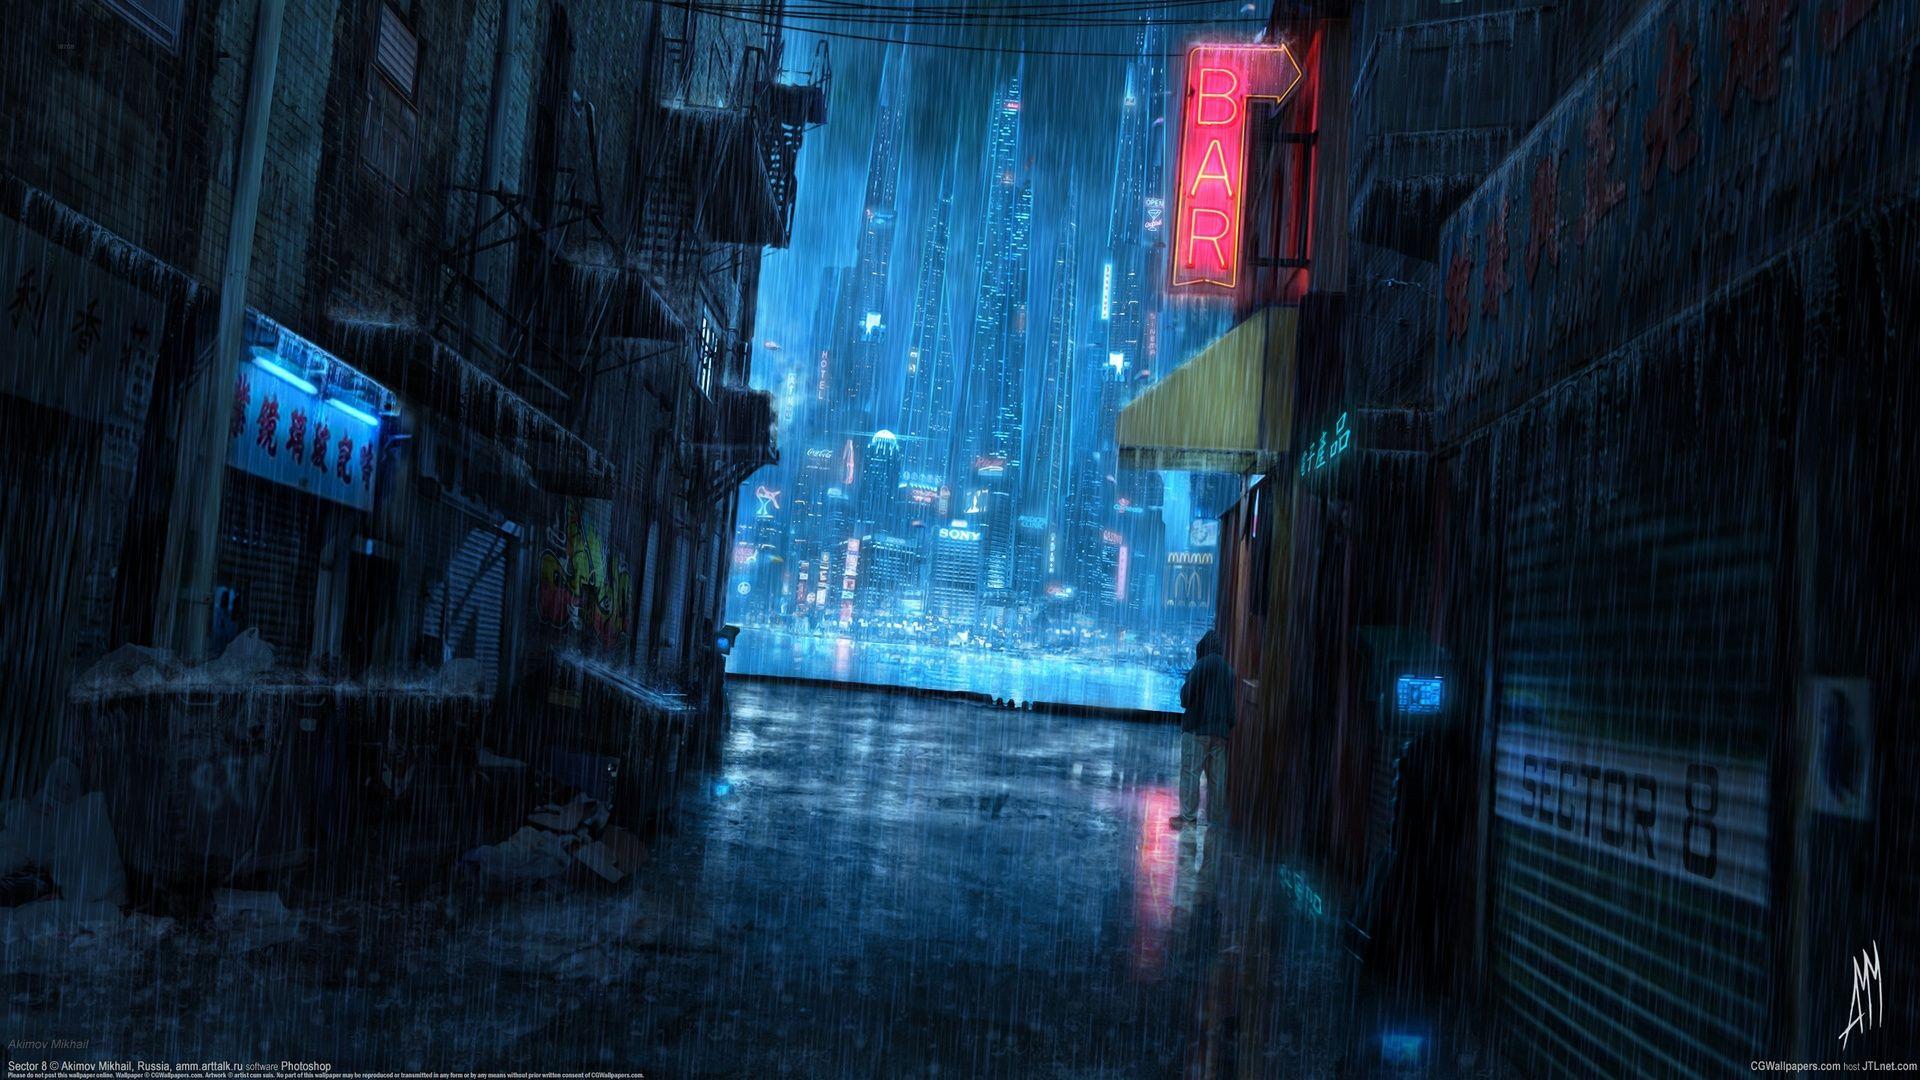 Patreon Anime Scenery Wallpaper Anime Scenery Rainy City Futuristic anime wallpaper 1920x1080